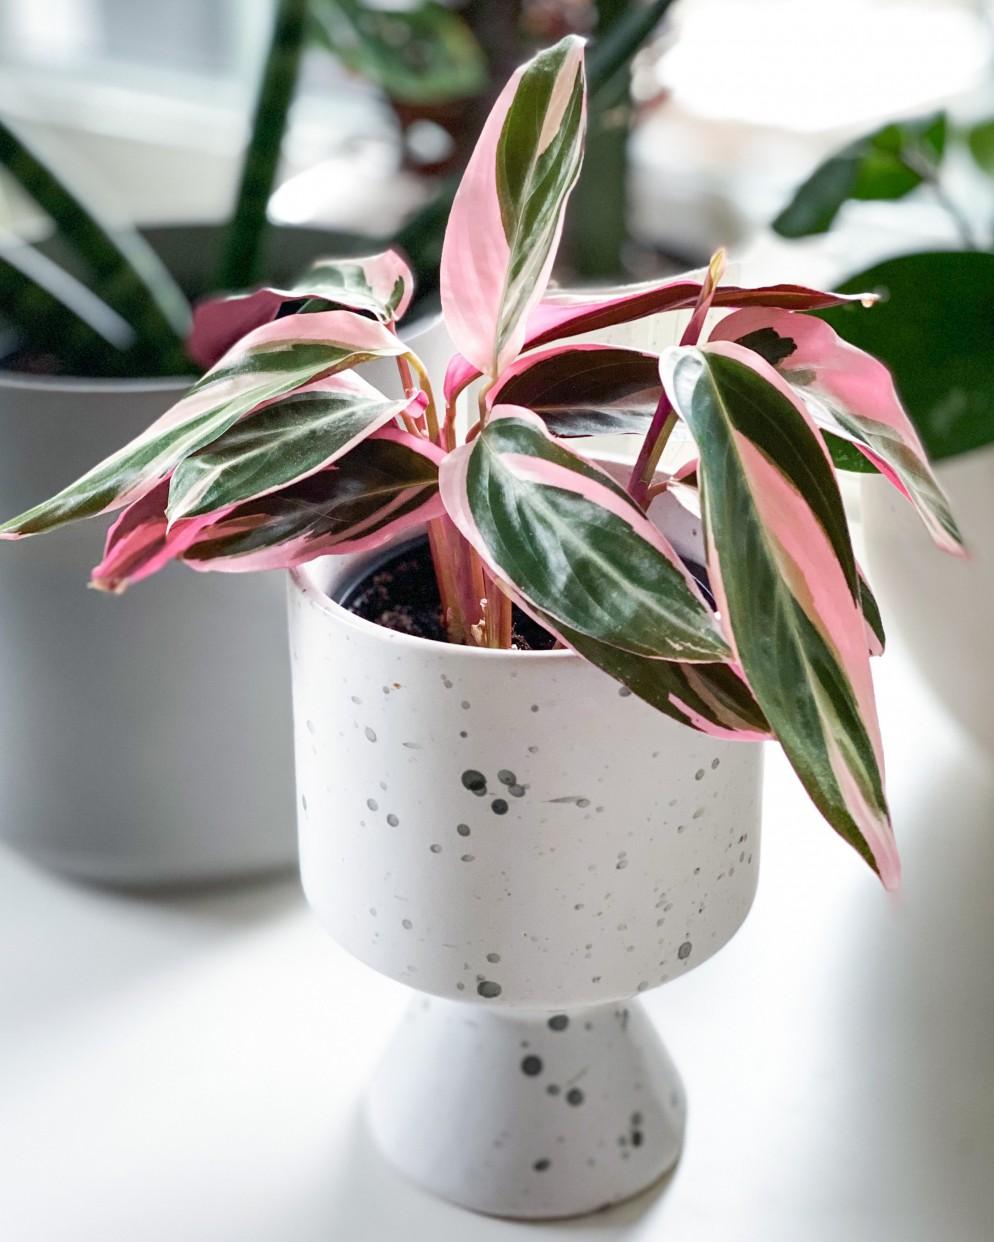 piante-da-appartamento-colorate-stromanhte-triostar-Evelyn Sisco @greenwithevy